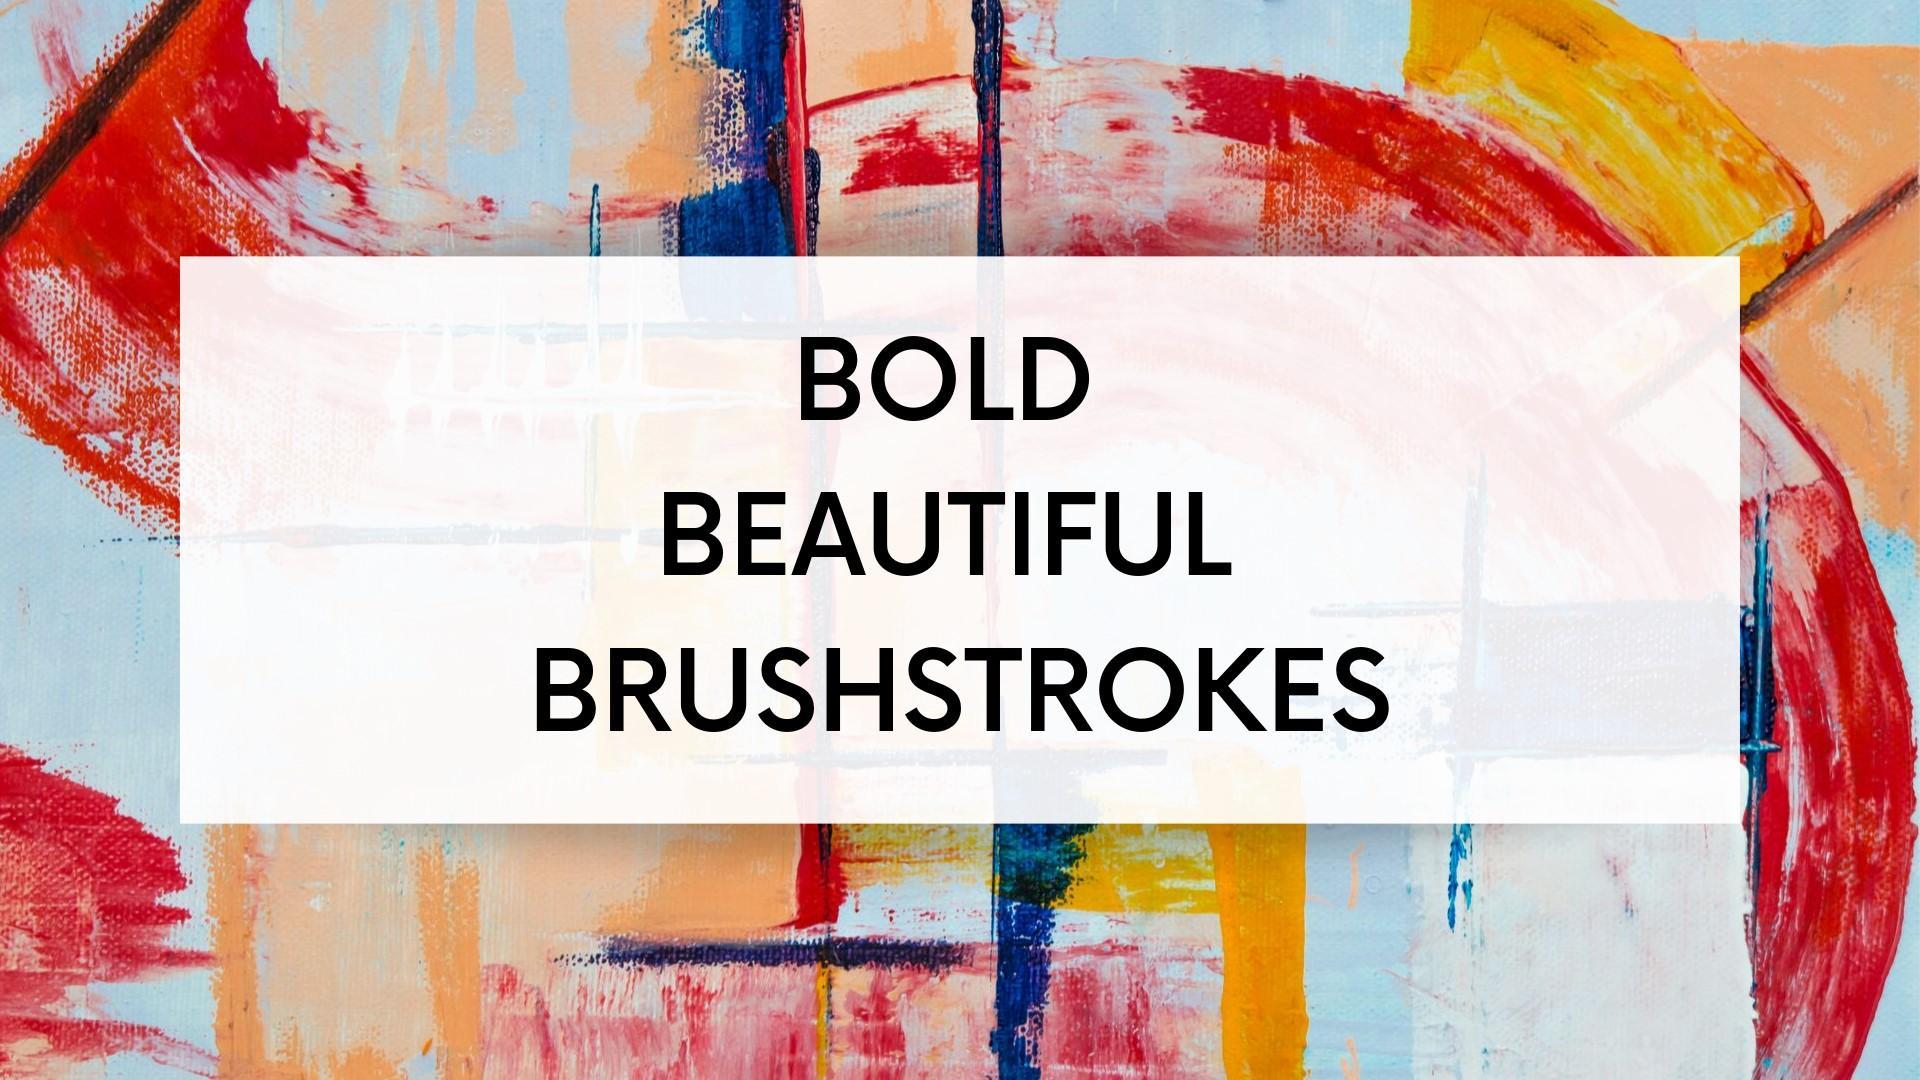 Bold, Beautiful Brushstrokes